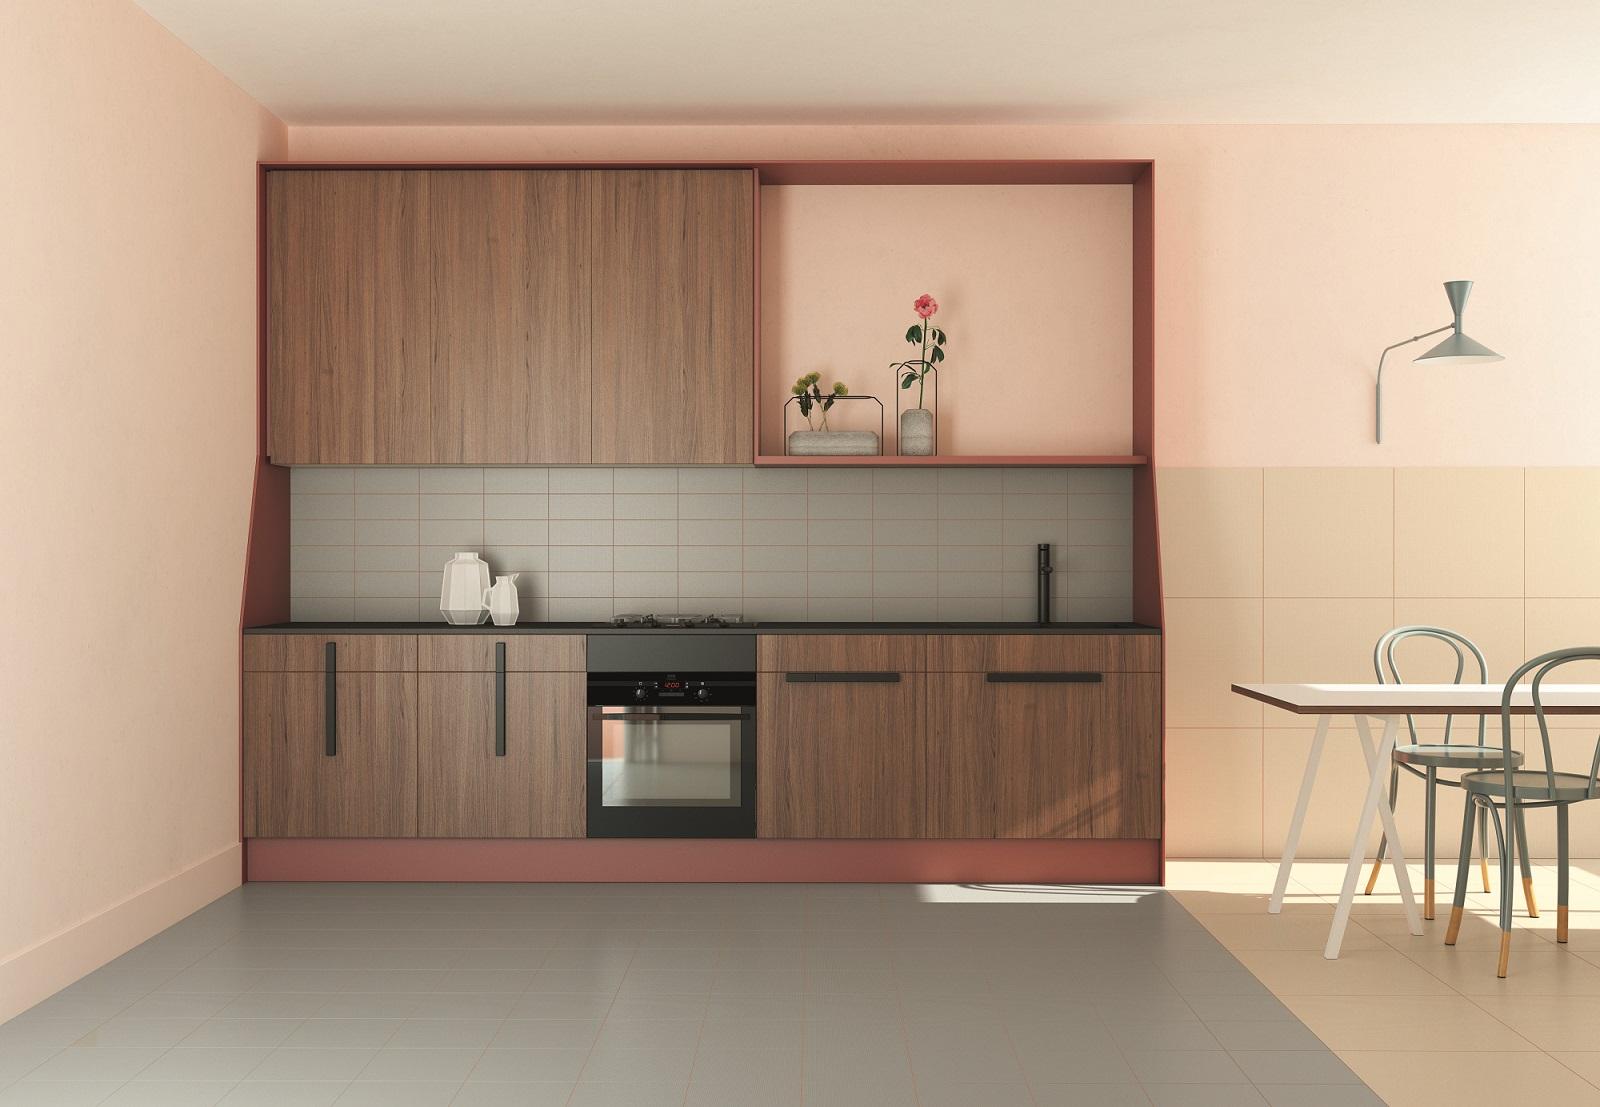 17R01-CV-SH2-Cucina-Generale-C08